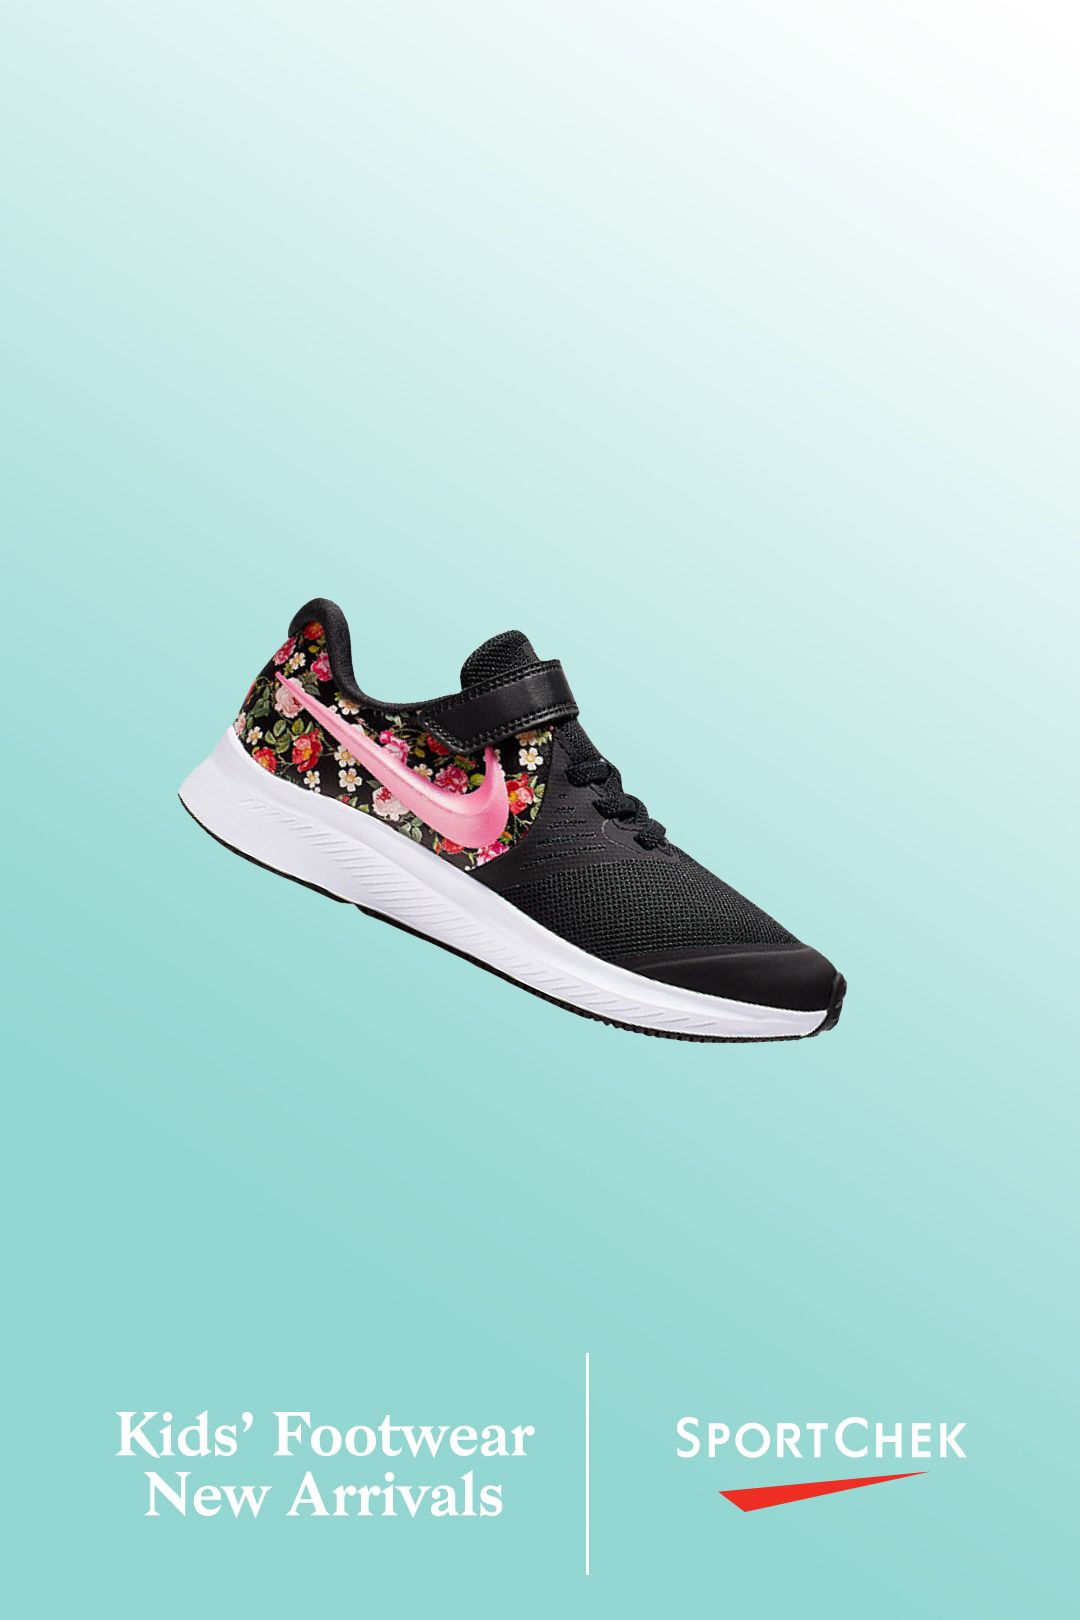 estudiar Dar derechos Joya  Clothes, Shoes & Gear for Sale Online. Your Better Starts Here | Nikes  girl, School shoes, Nike runners